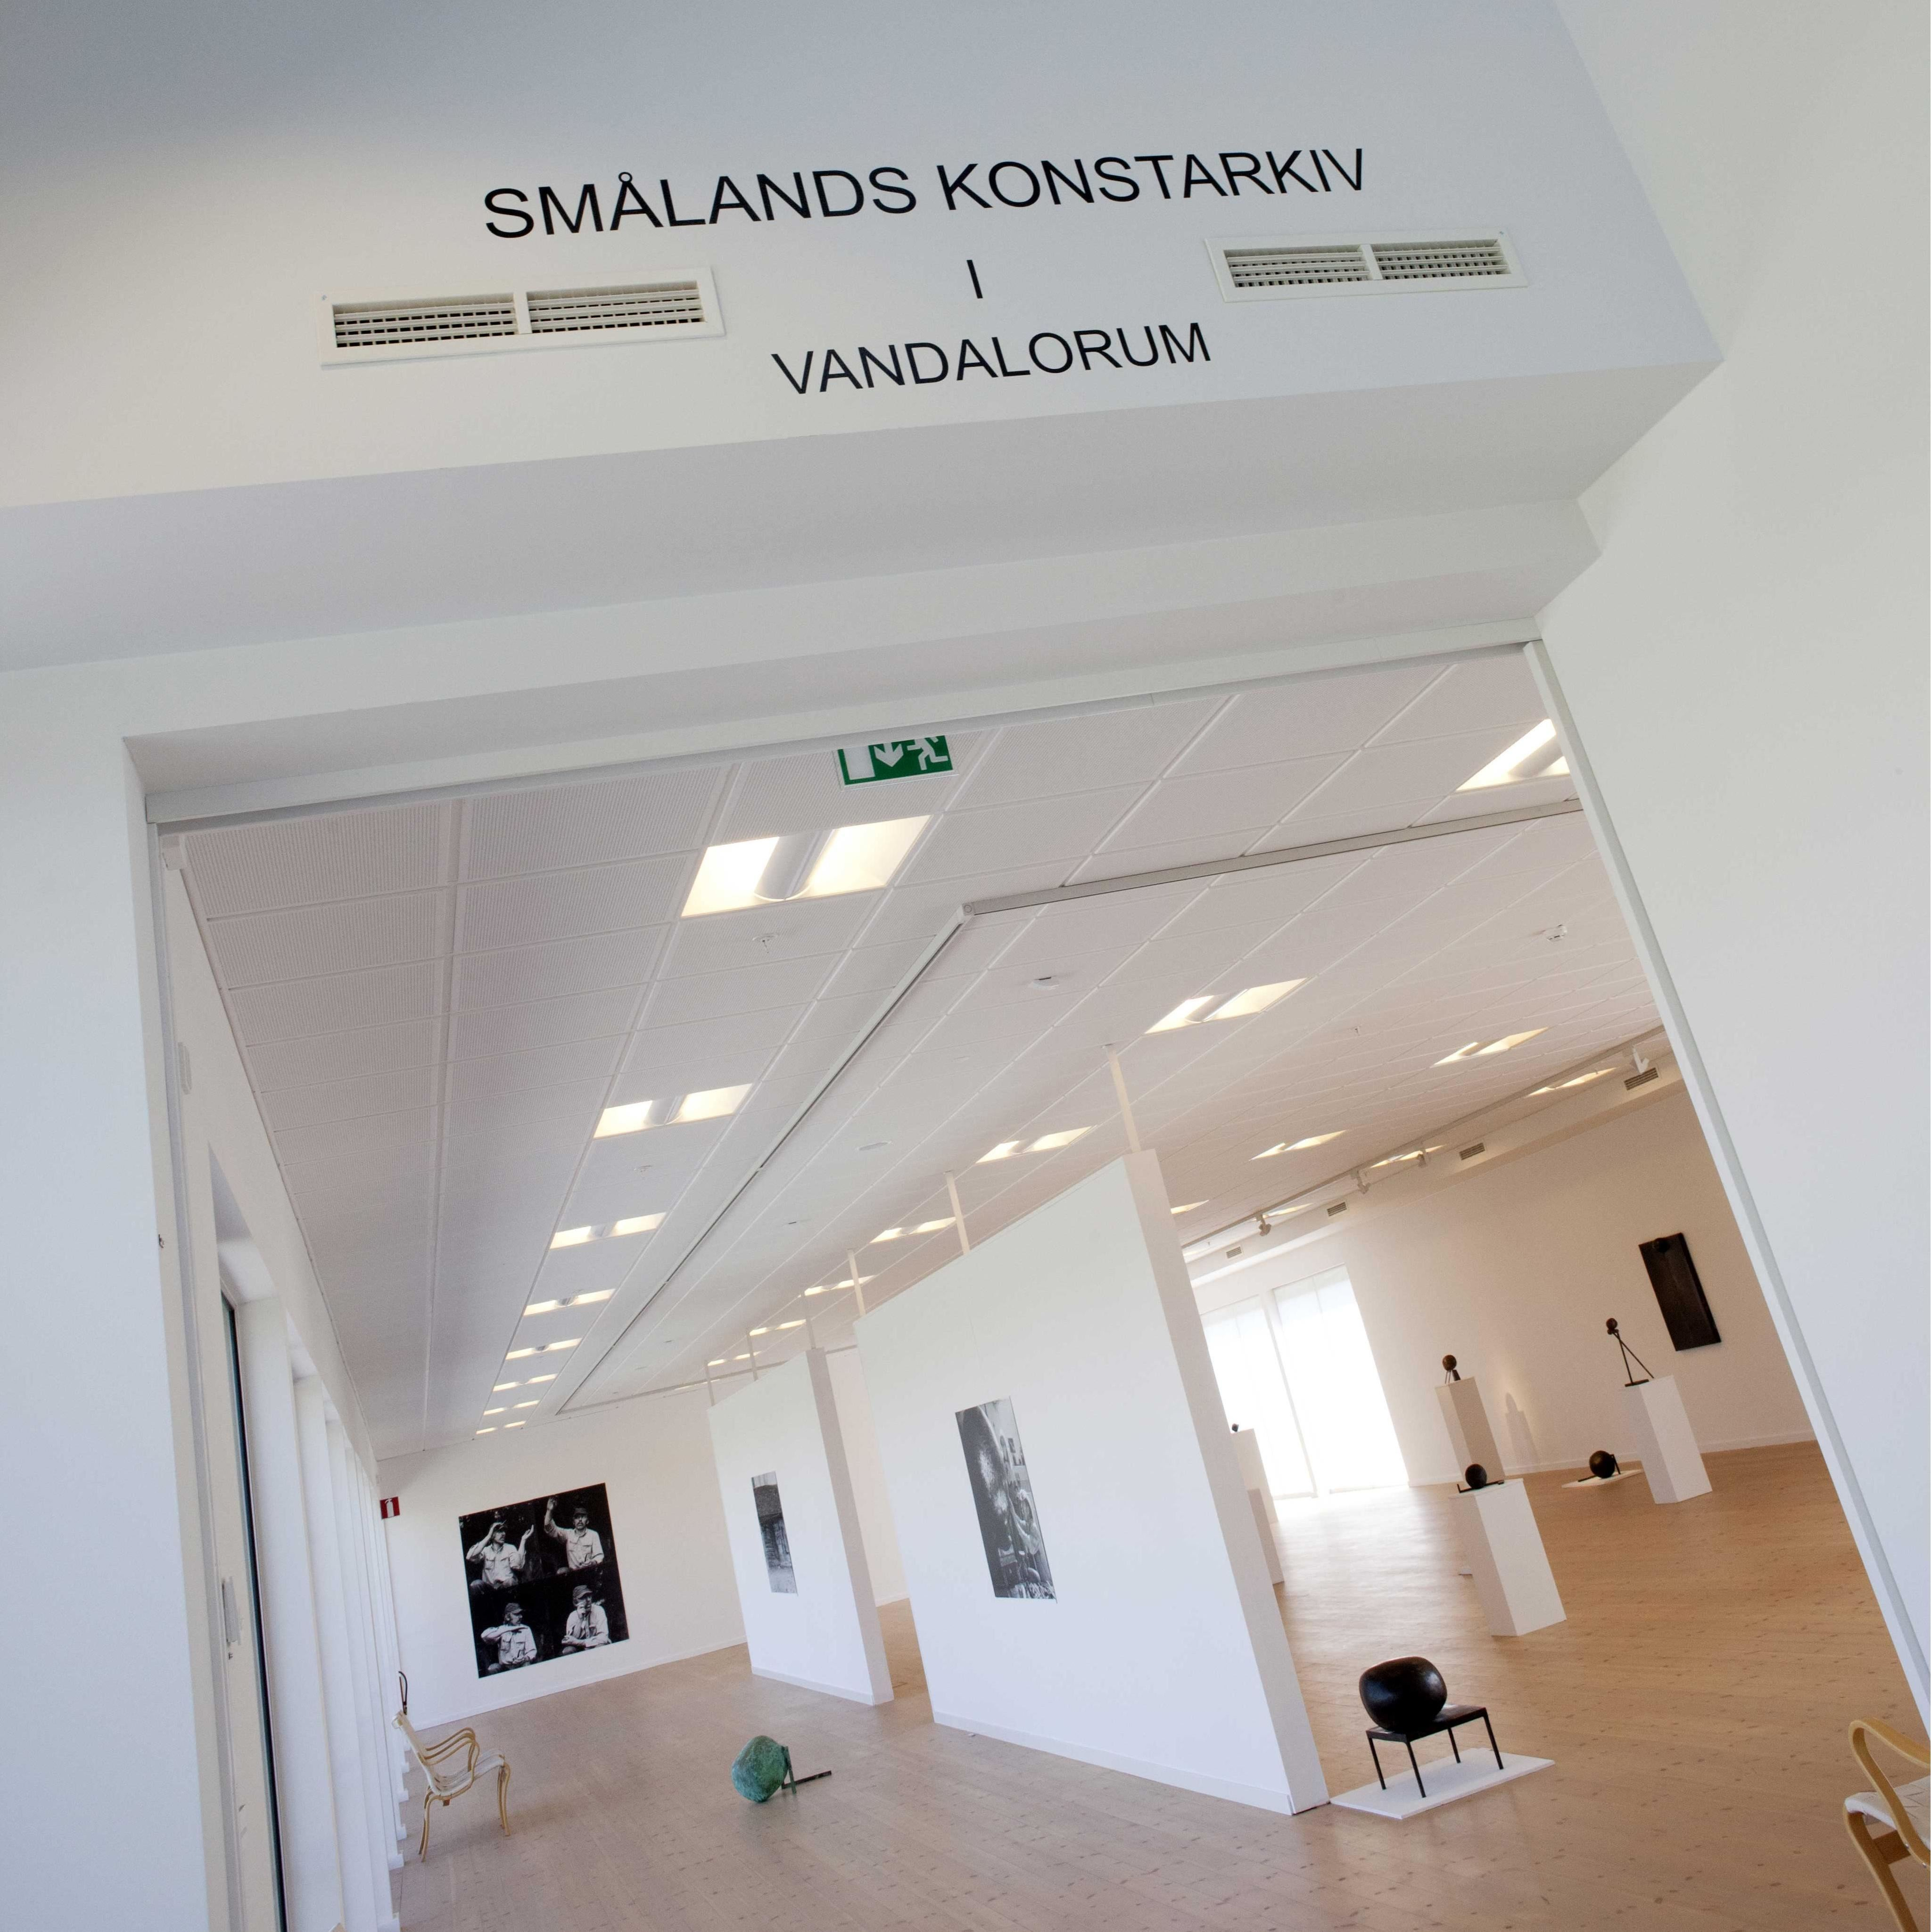 Vandalorum und Smålands Konstarkiv